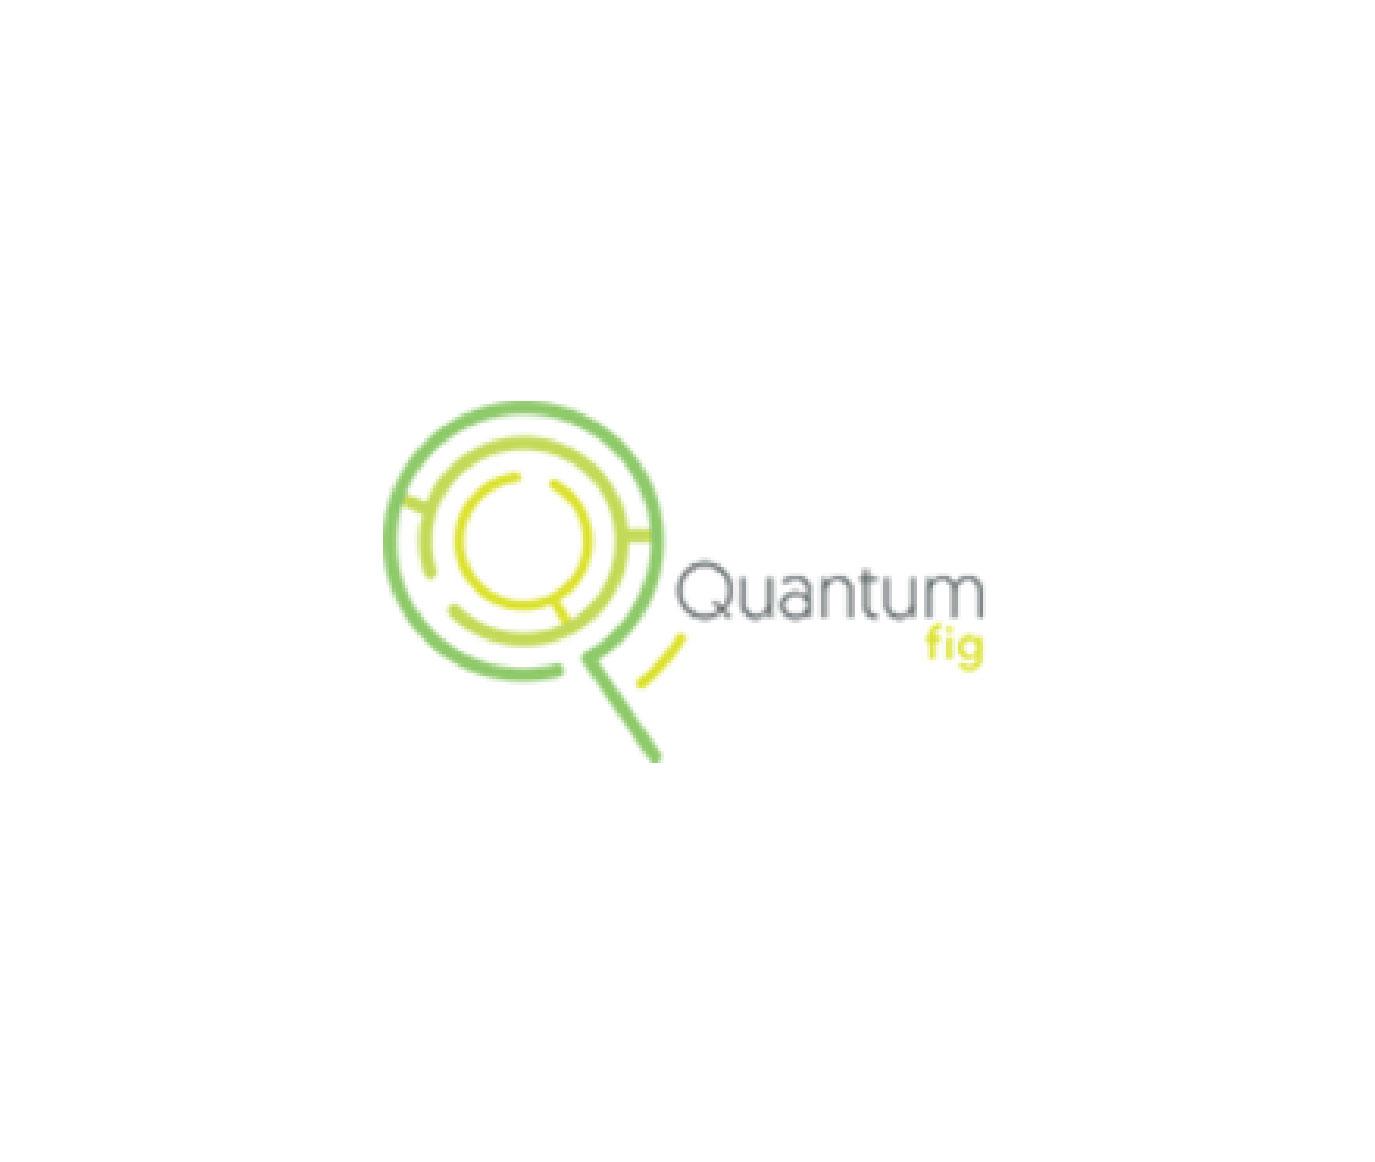 tactive consulting - quantum logo resize 1